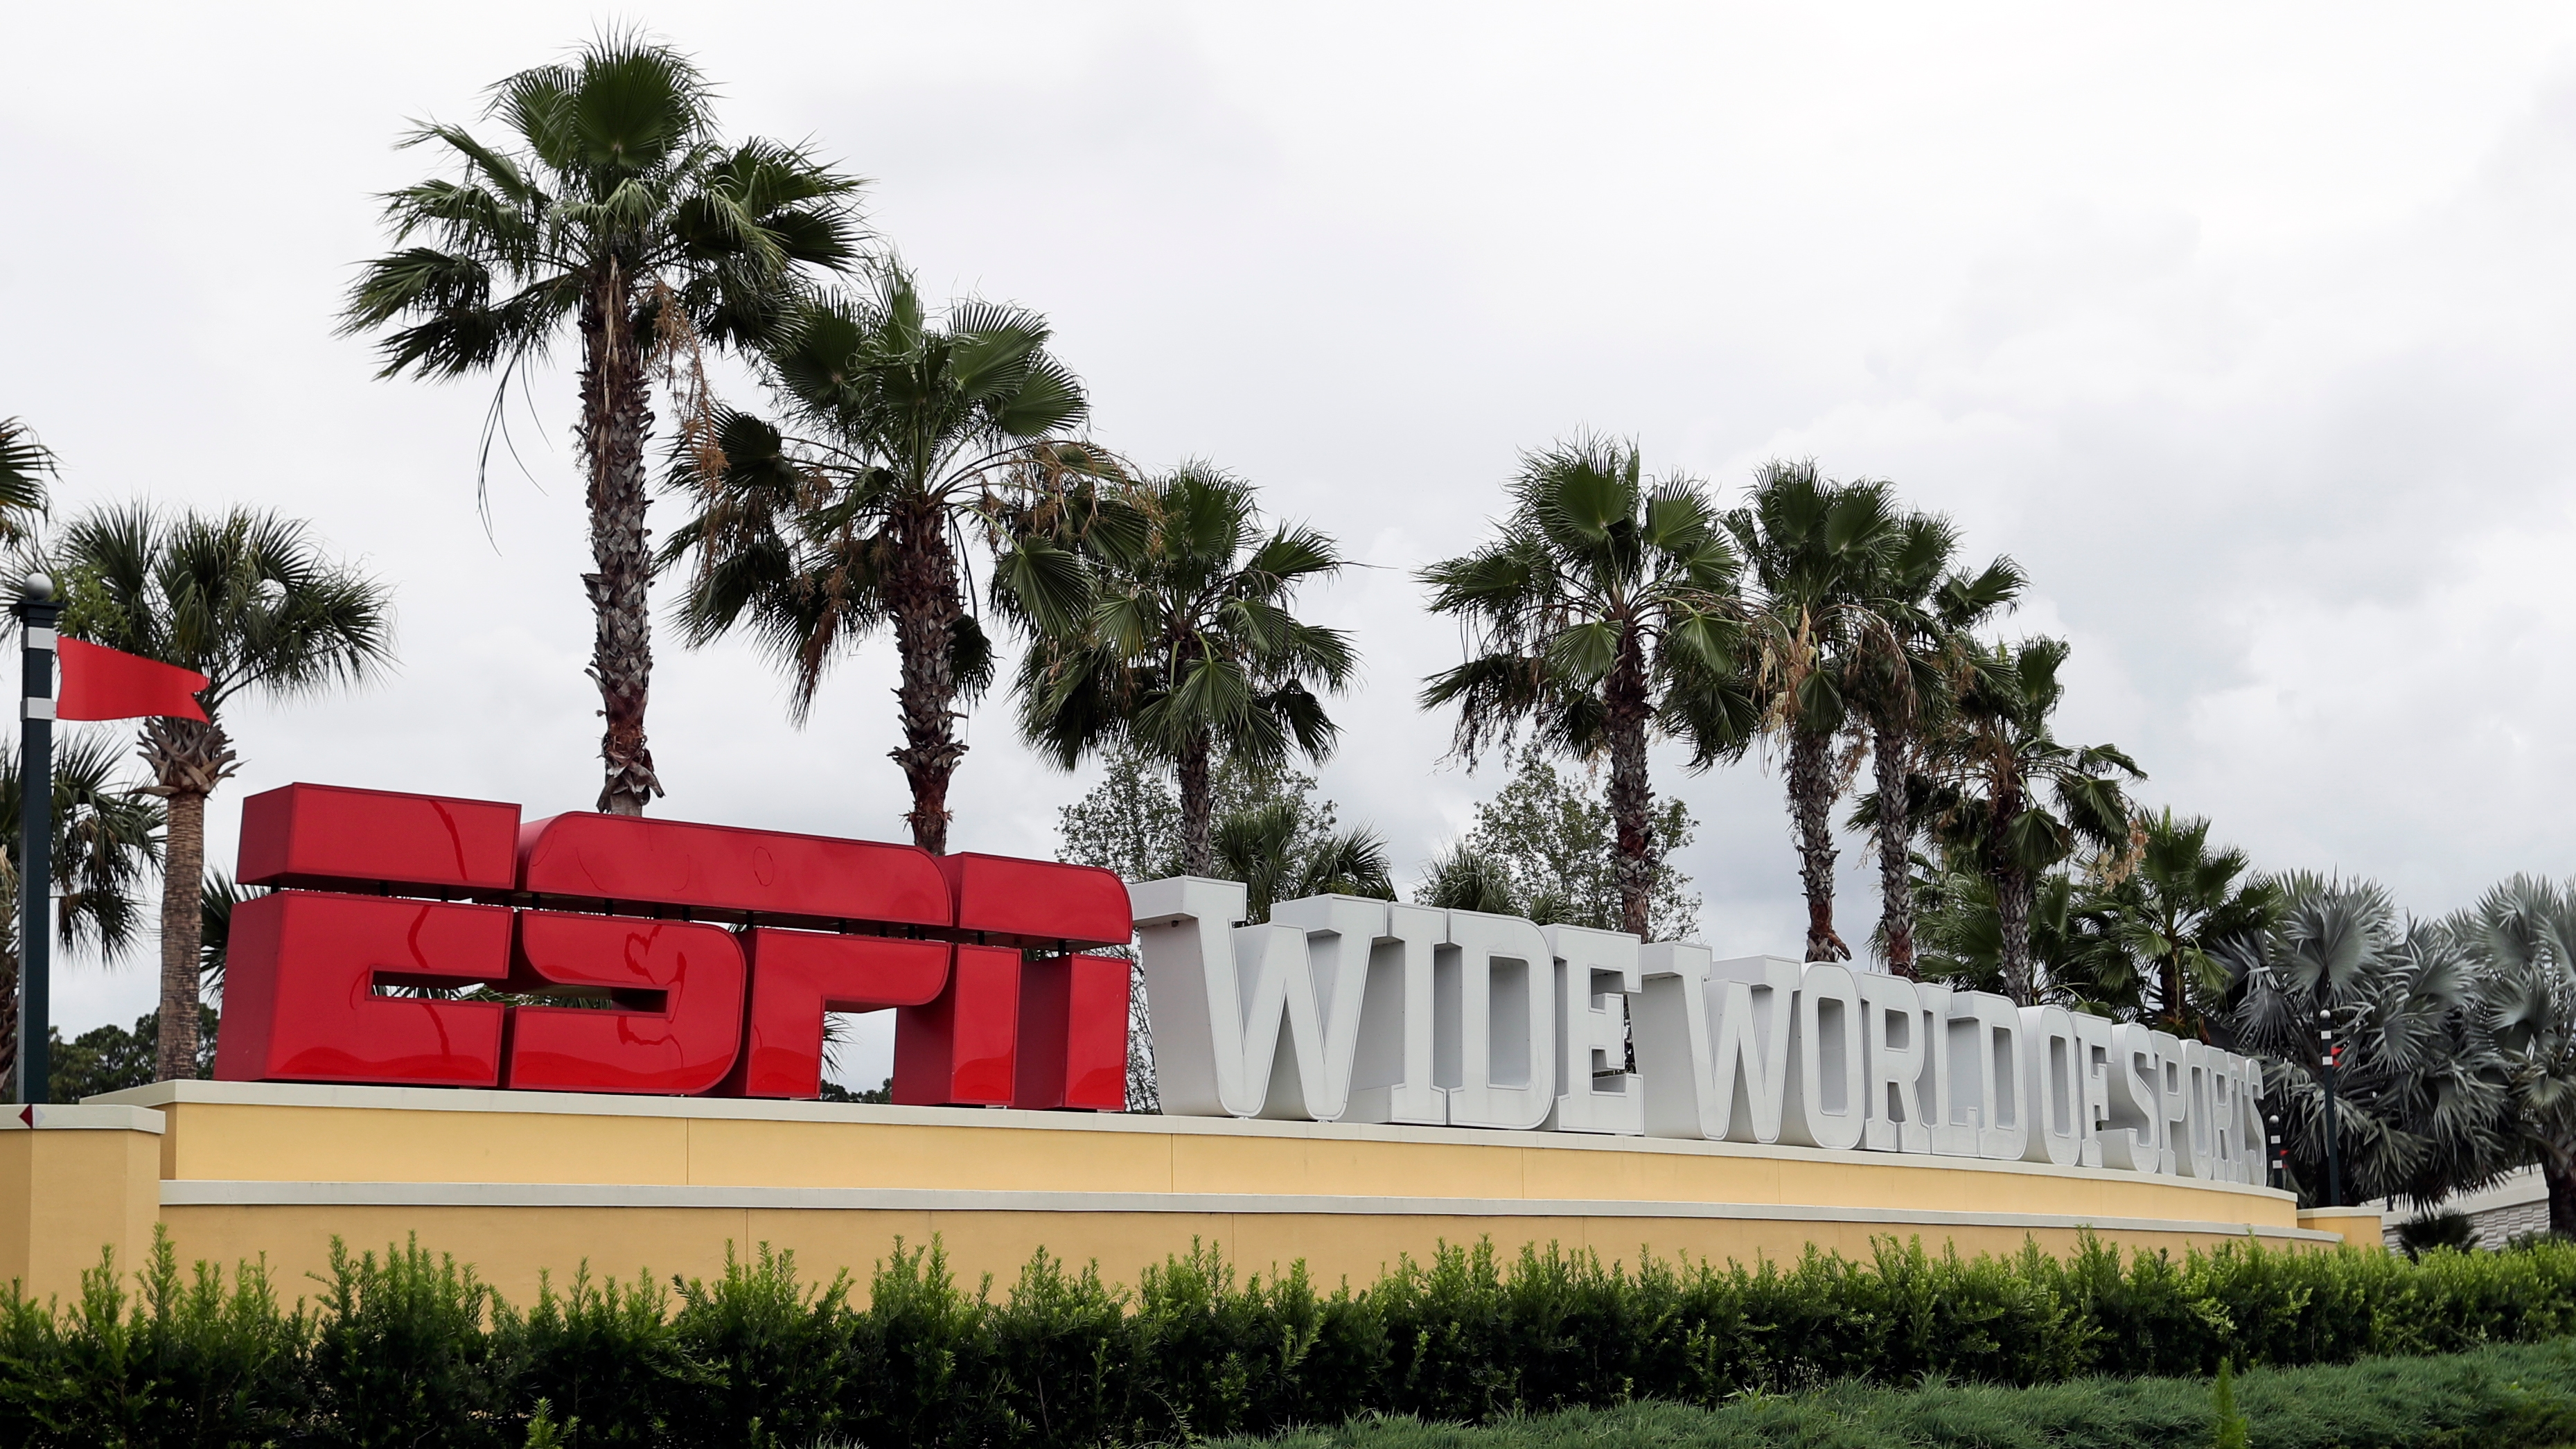 Six Major League Soccer Players Test Positive For Coronavirus In Florida